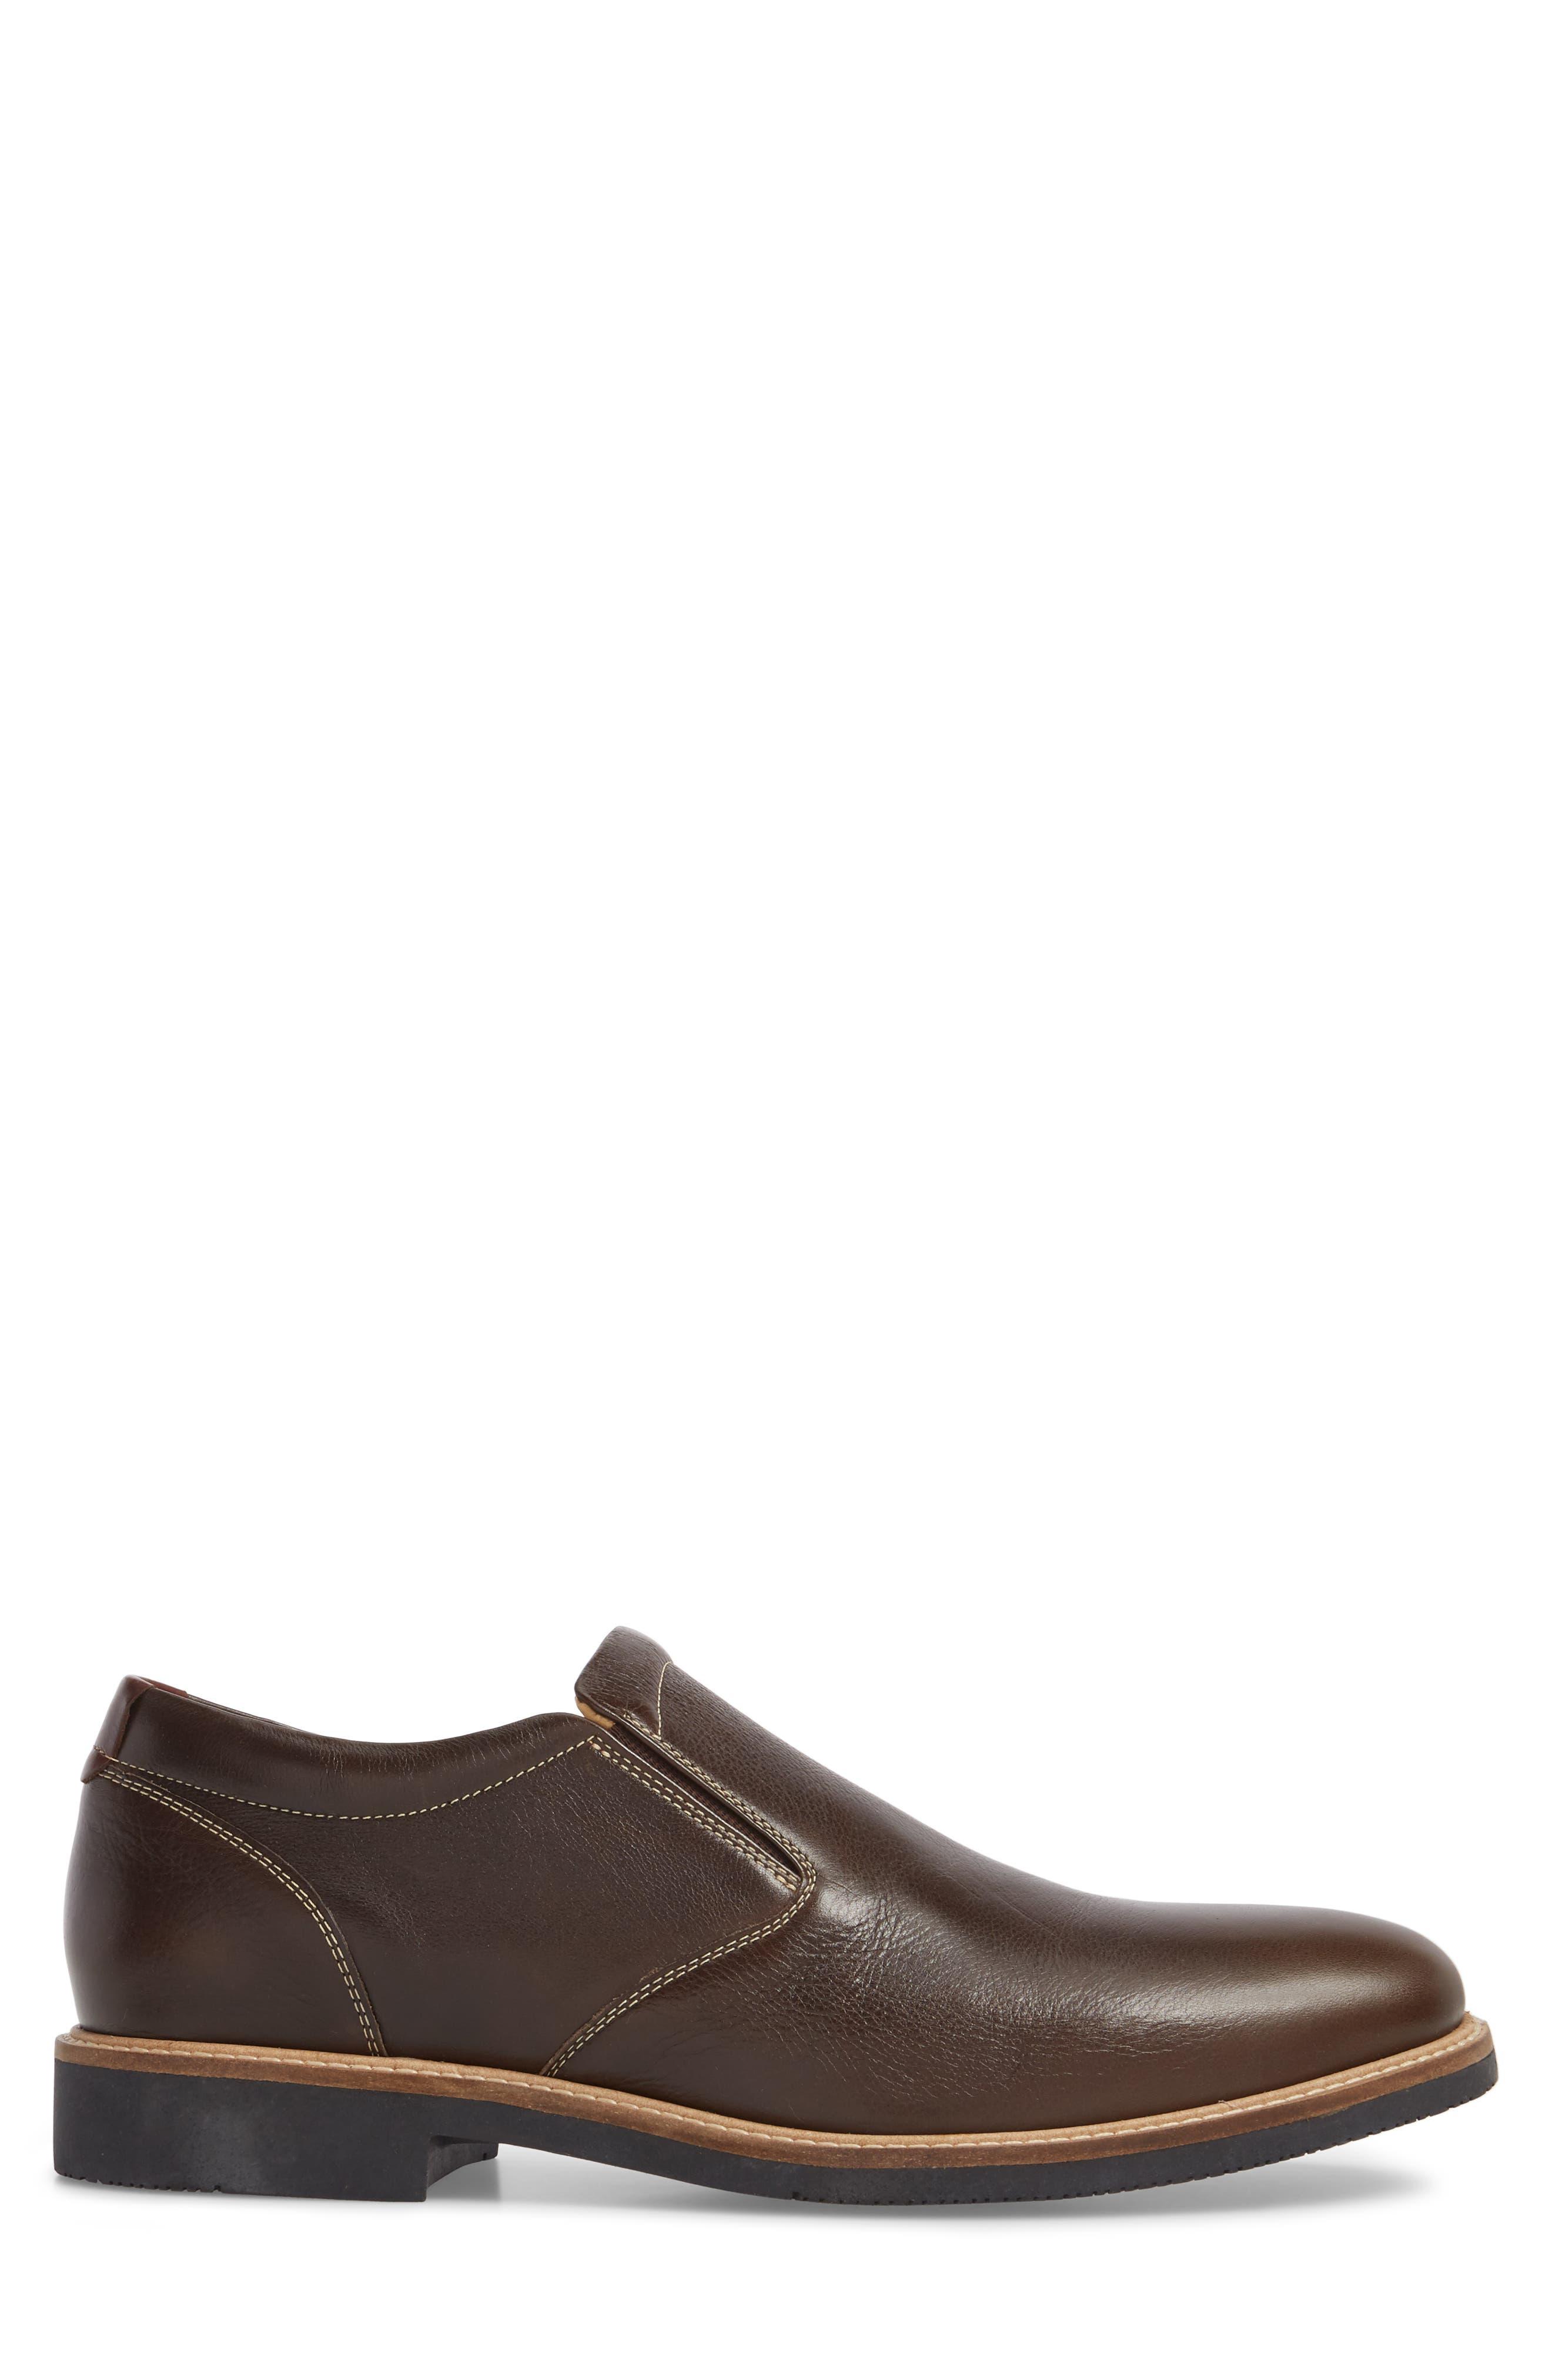 Barlow Plain Toe Slip-On,                             Alternate thumbnail 3, color,                             Dark Brown Leather